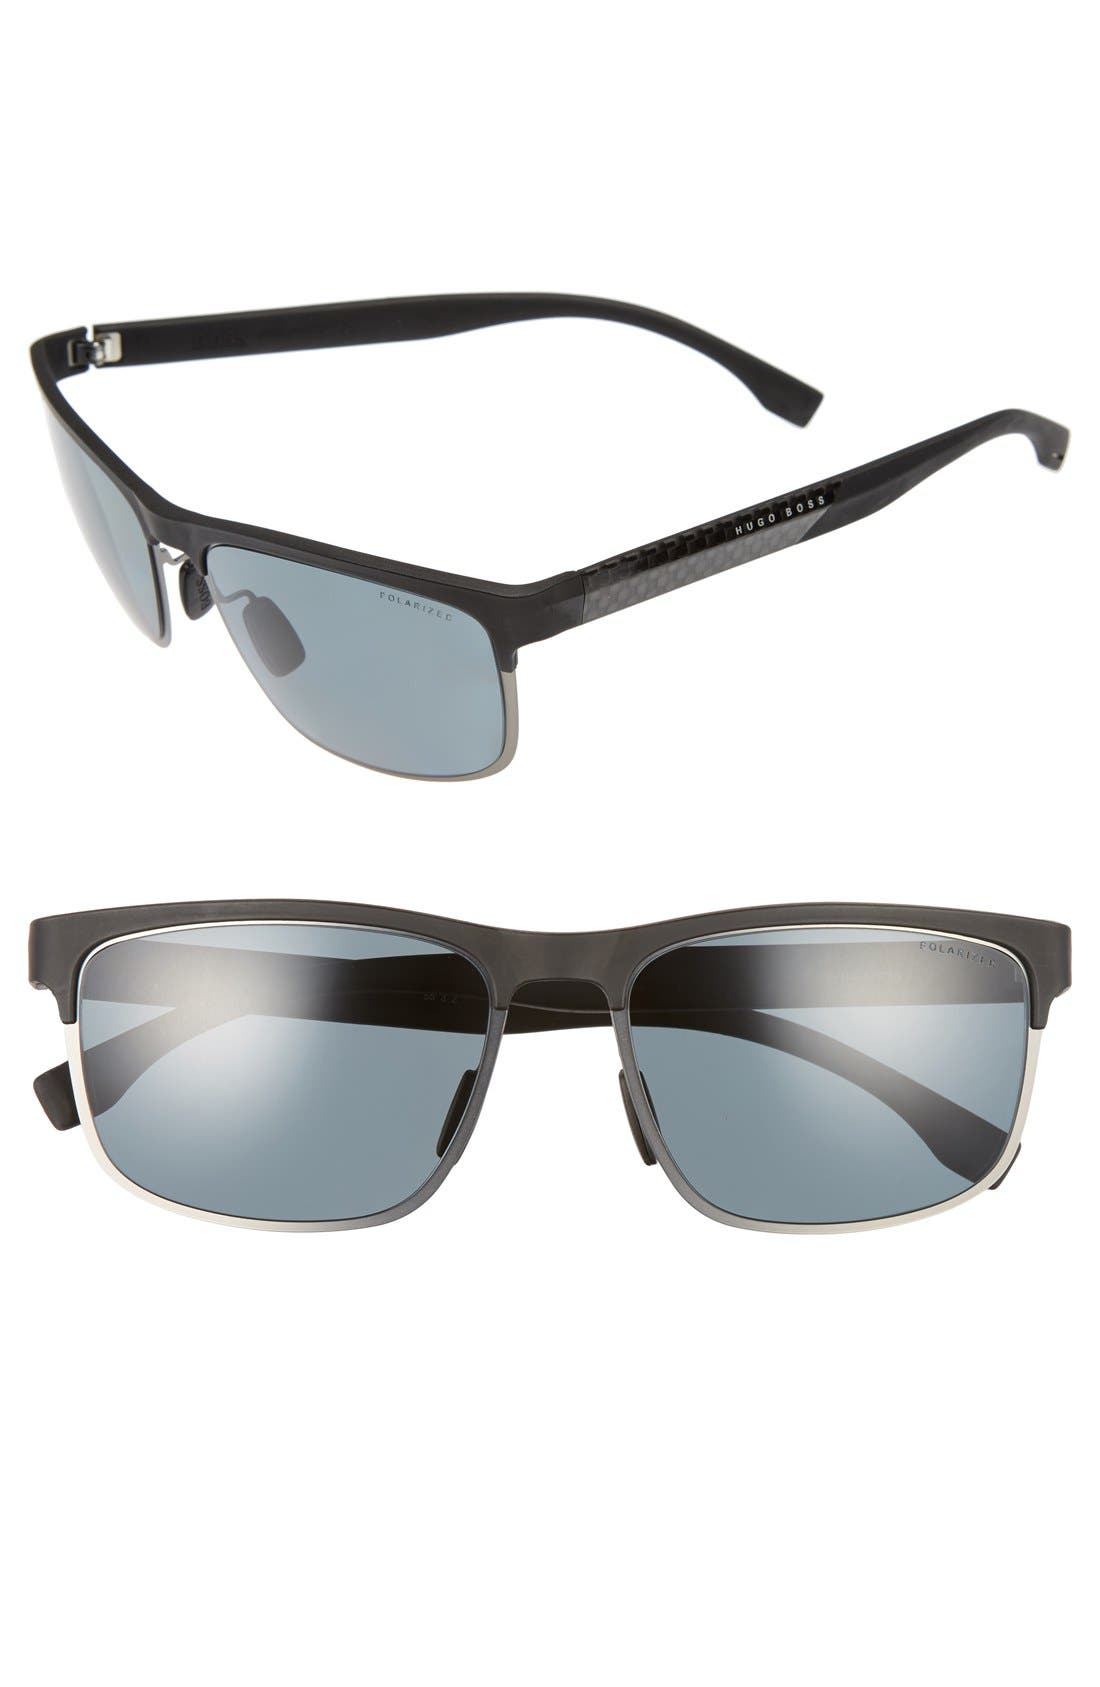 58mm Polarized Sunglasses,                             Alternate thumbnail 3, color,                             001